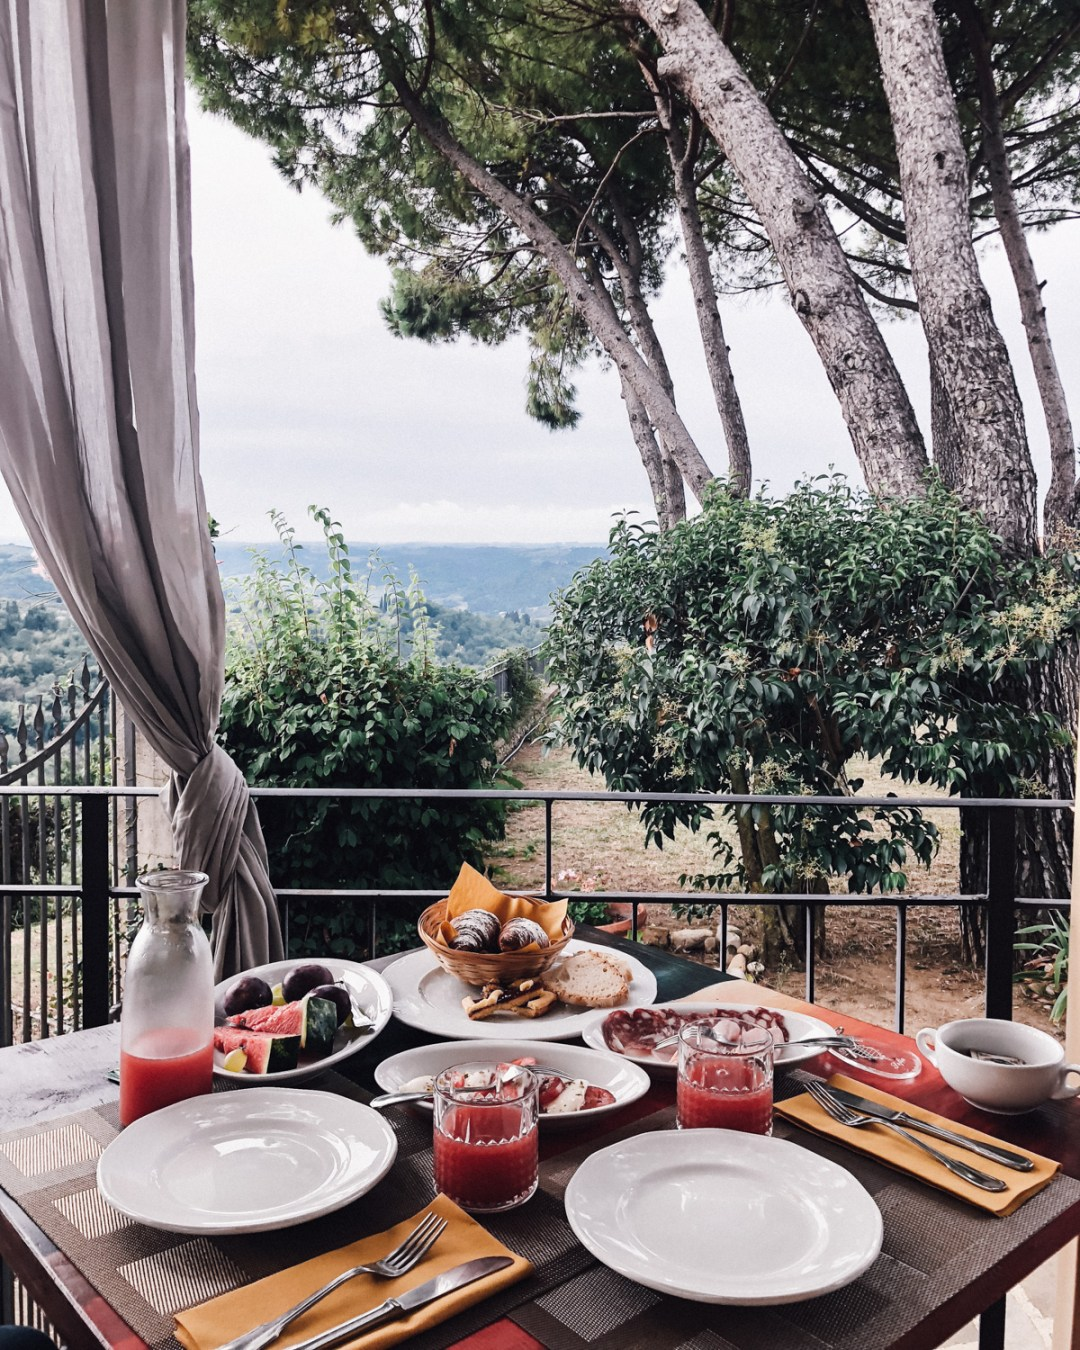 inastil, Ü50Blogger, Reiseblogger, Toskana, Villa, Florenz, Siena, Certaldo, Lifestyle, Italienreise, Italienliebe, Cabriotour-43